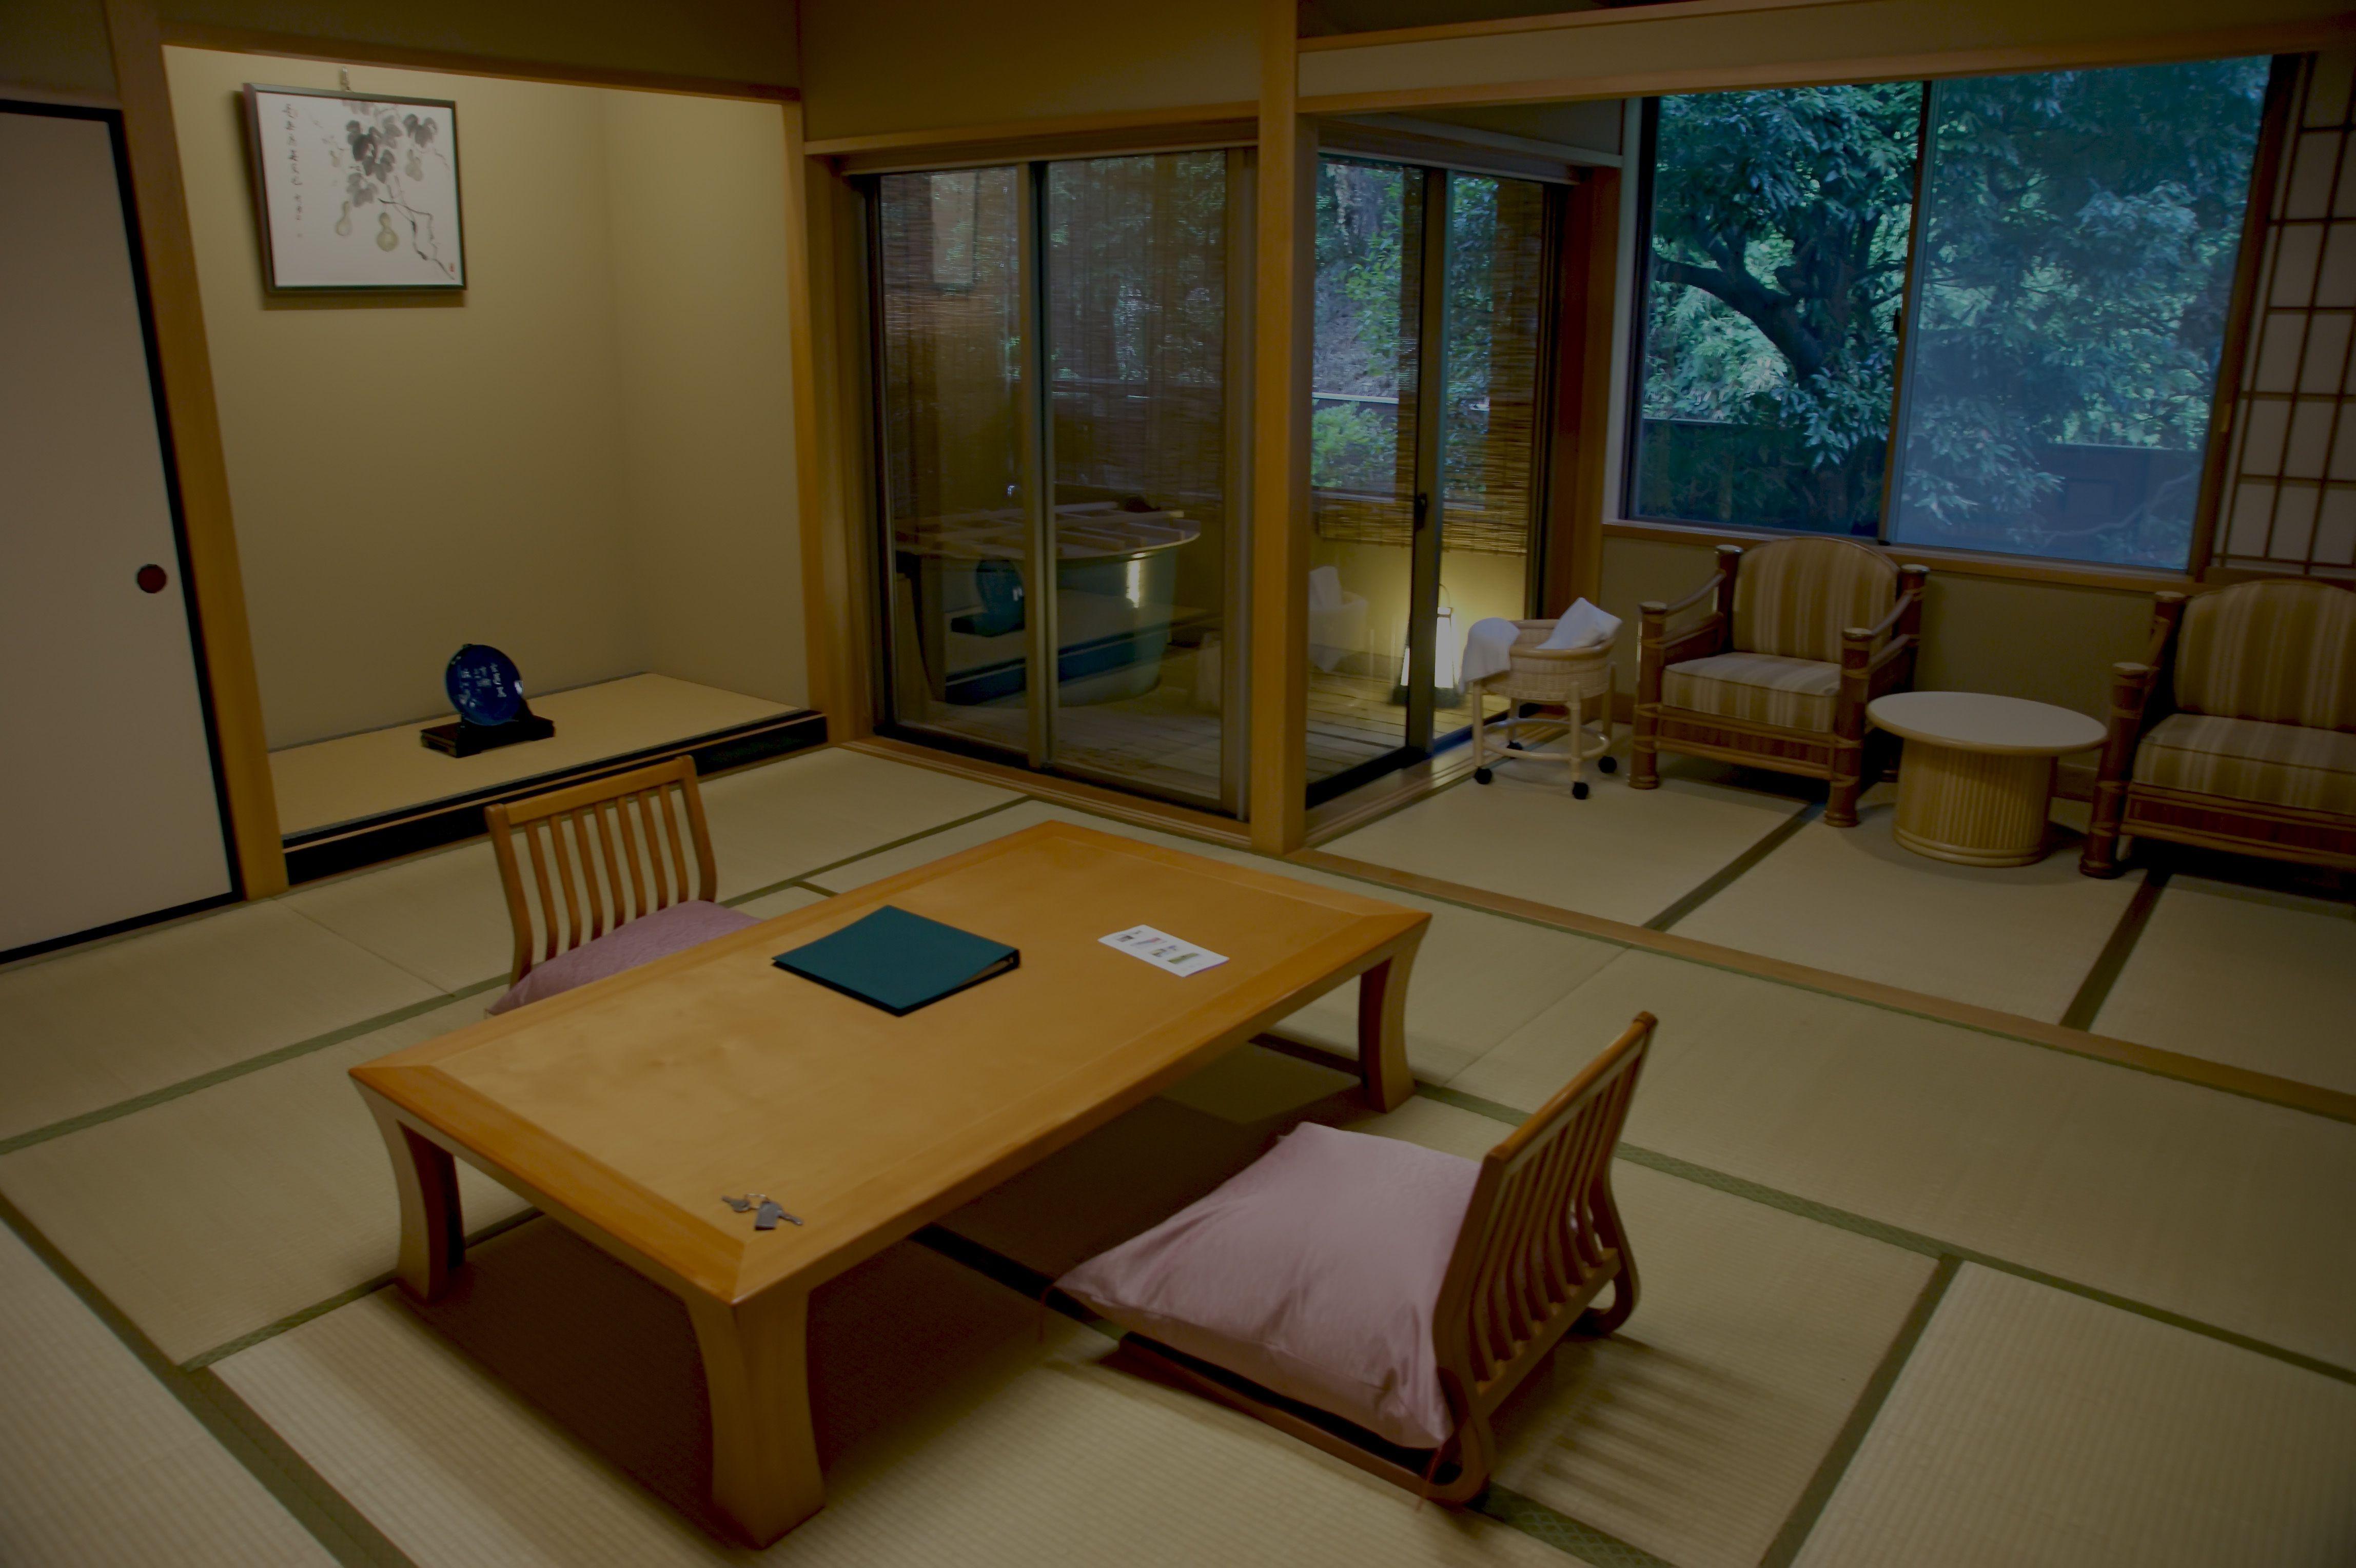 Minimalist Traditional Interior Living Room Design Ideas The